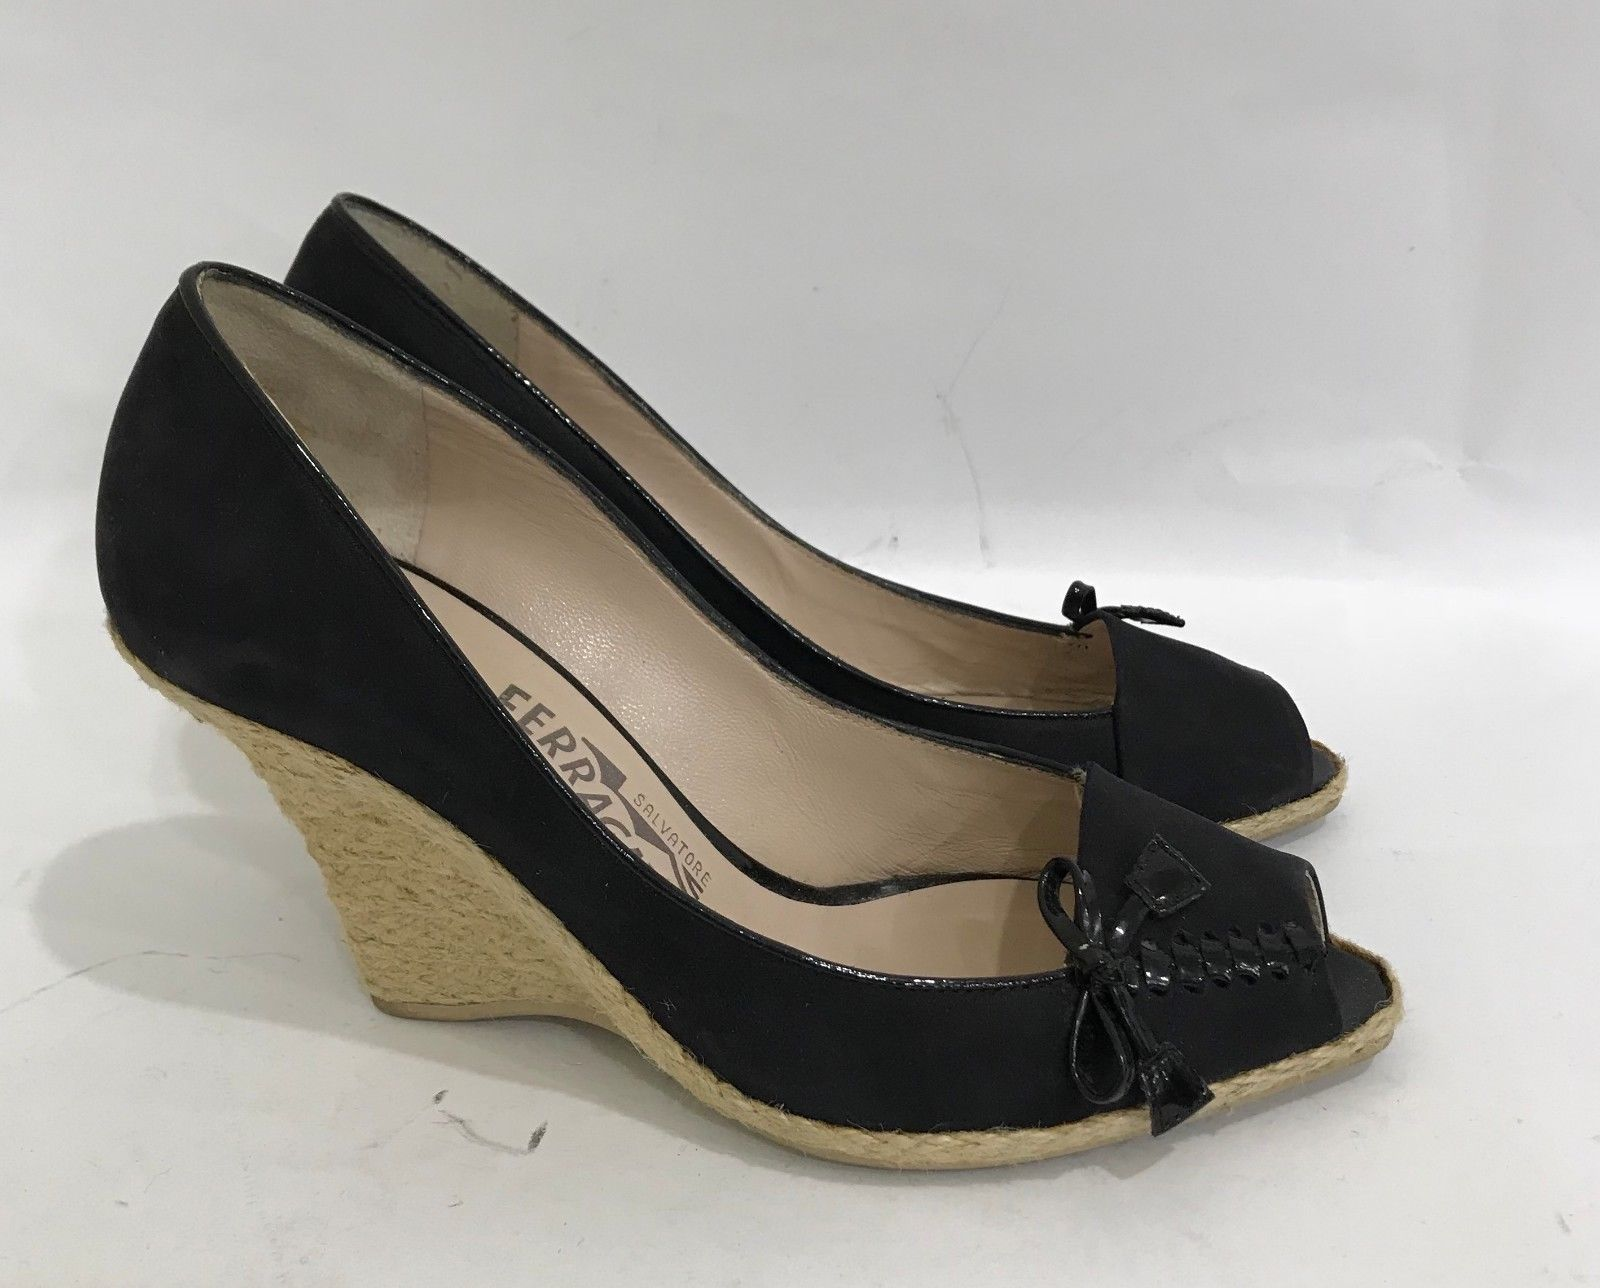 c7bfccfa76968 Salvatore Ferragamo Black Suede High Wedge Heel Shoes Open Toe Pumps Size US  7